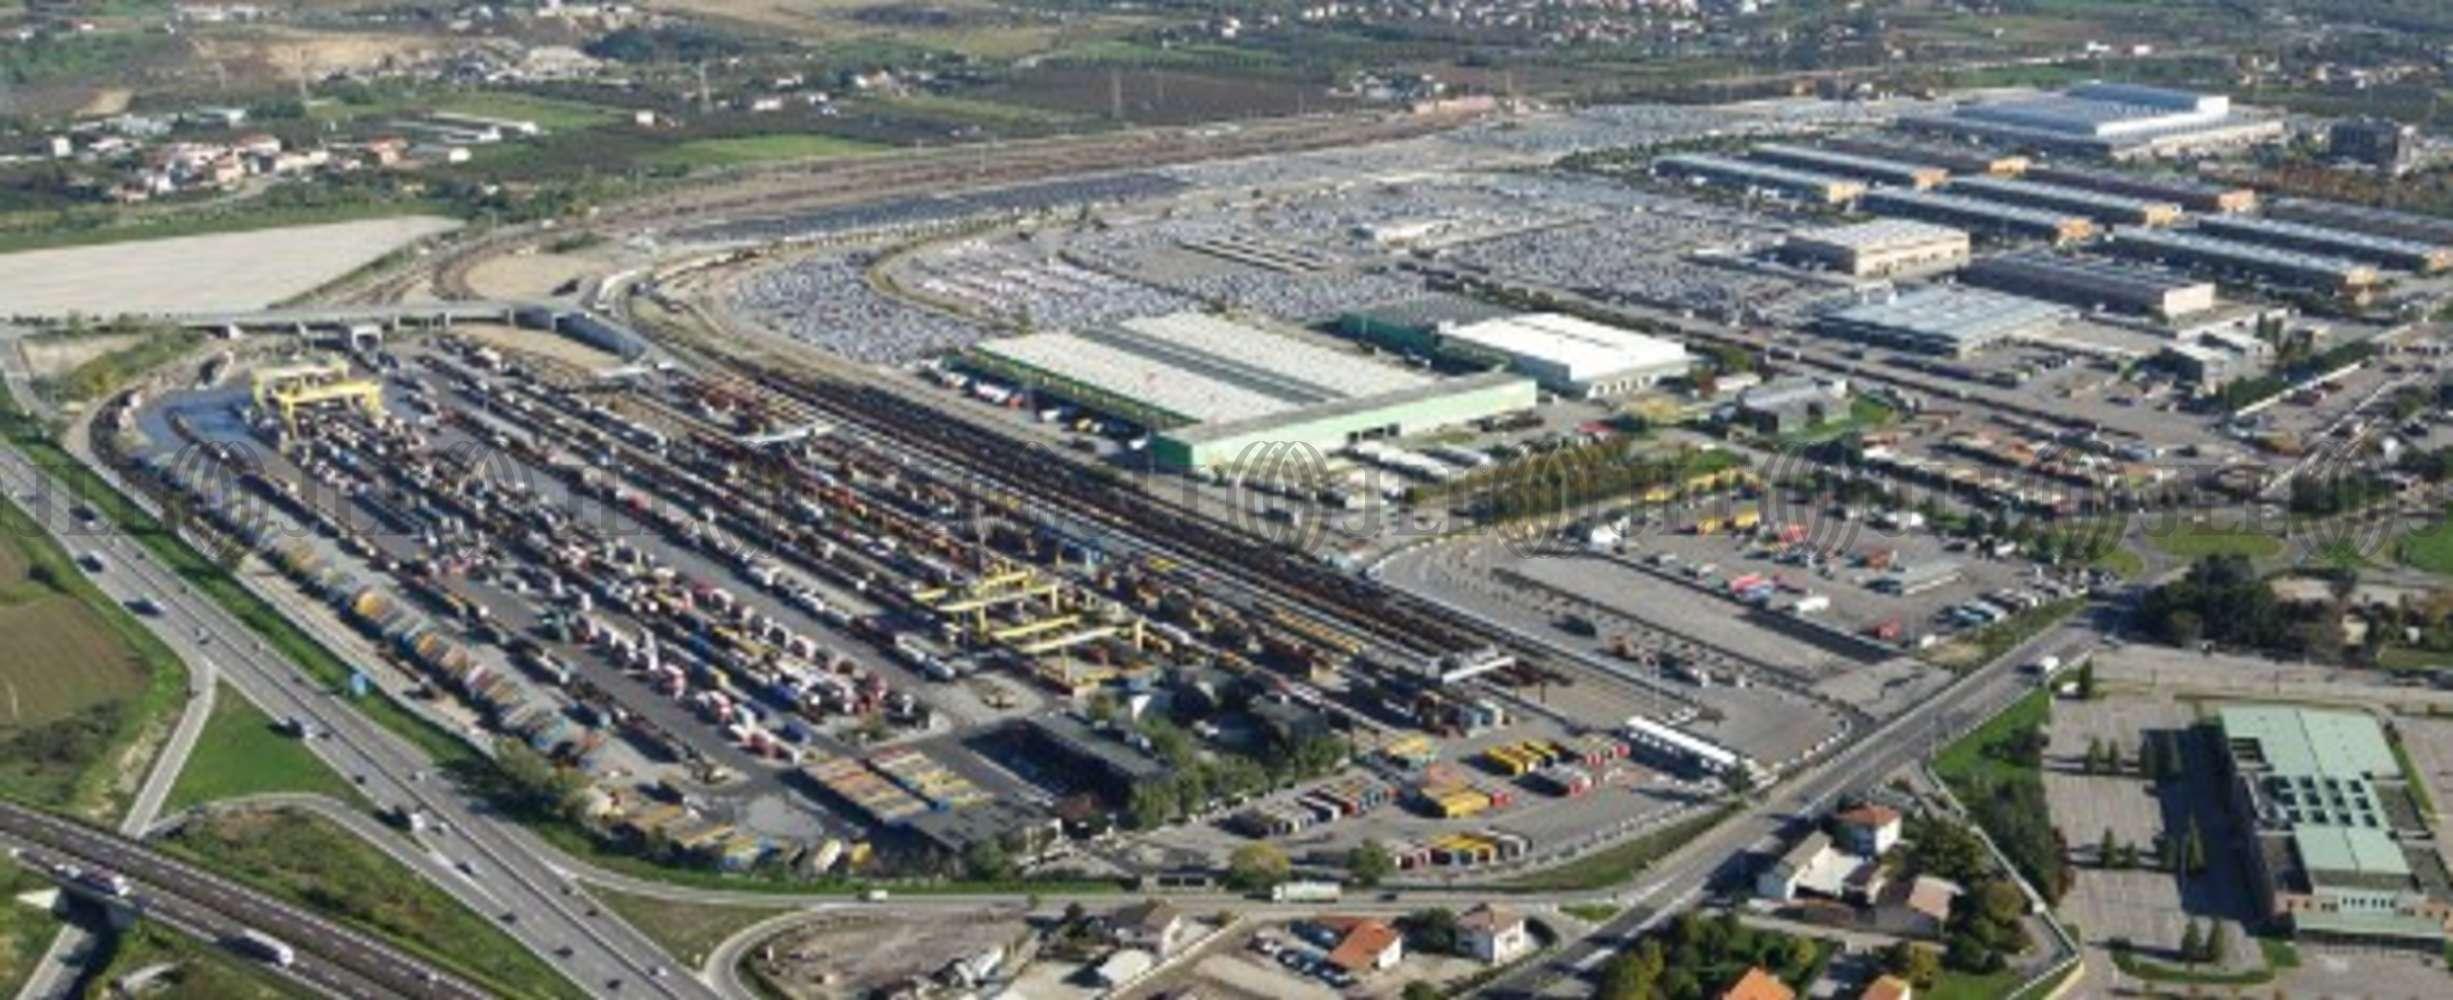 Magazzini industriali e logistici Verona, 37137 - Verona - Quadrante Europa